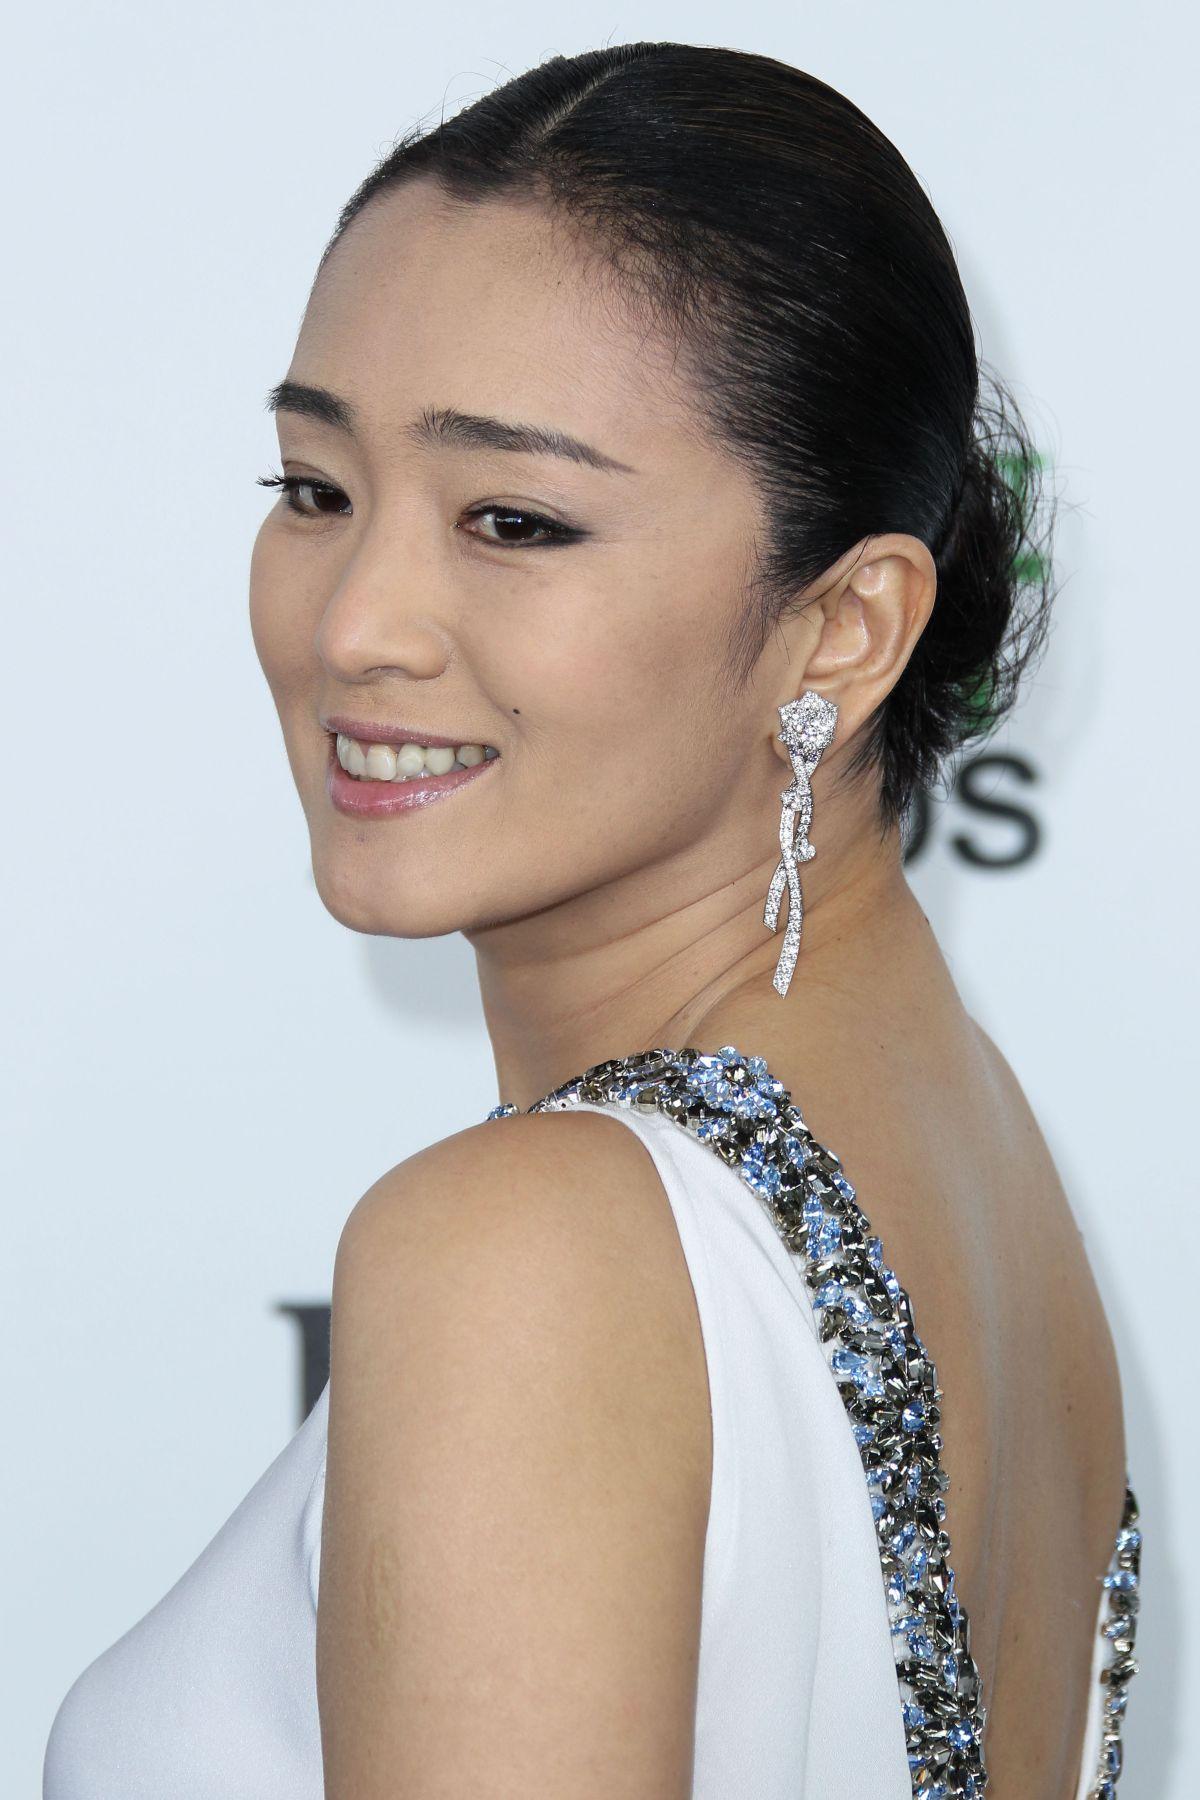 Gong Li photo gallery - 173 high quality pics of Gong Li